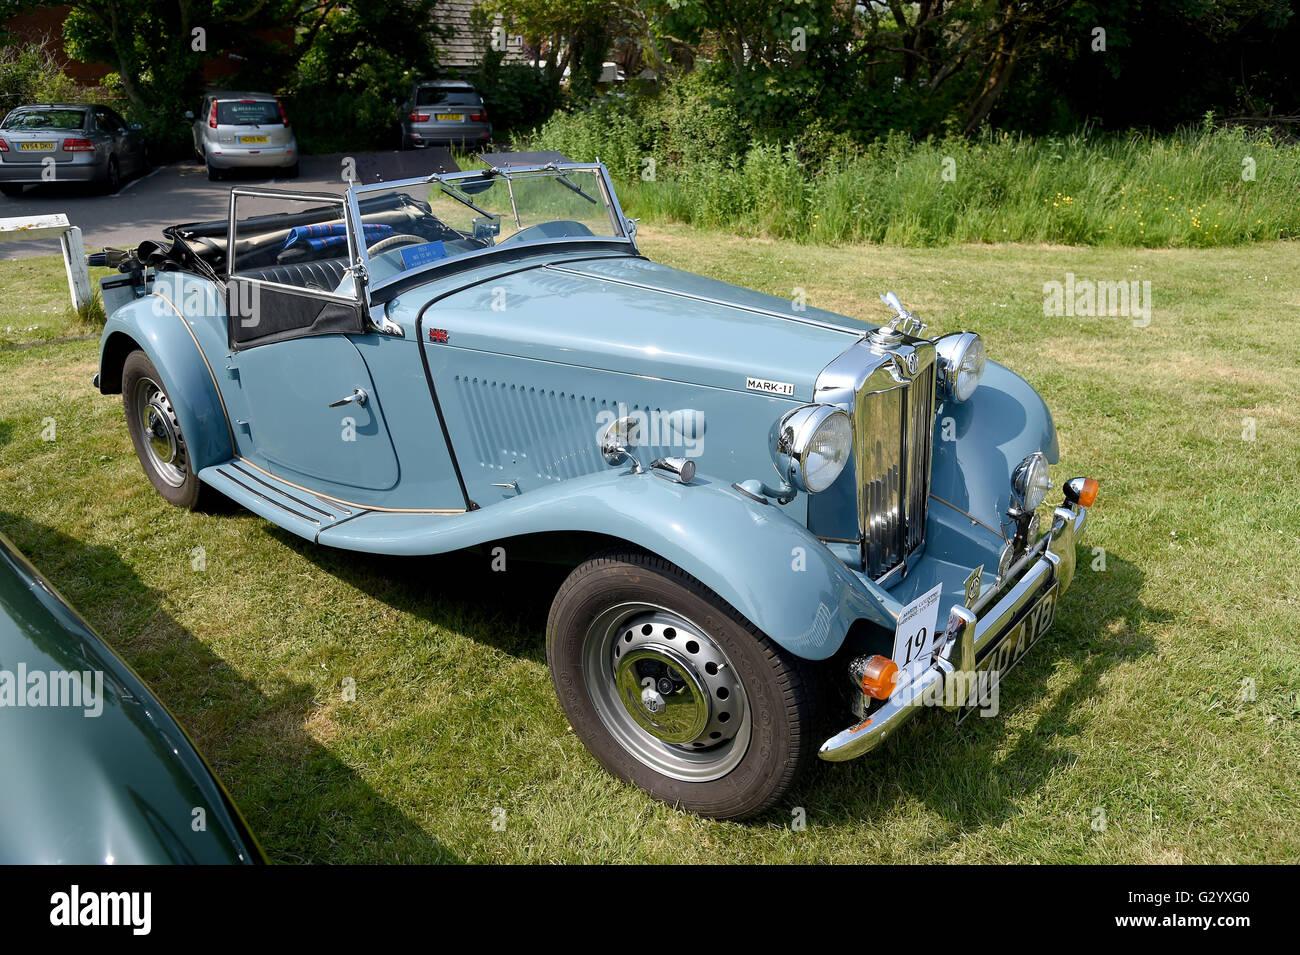 Weymouth, Dorset, UK. 05th June, 2016. 1953 MG TD Mark II. The Hardy ...